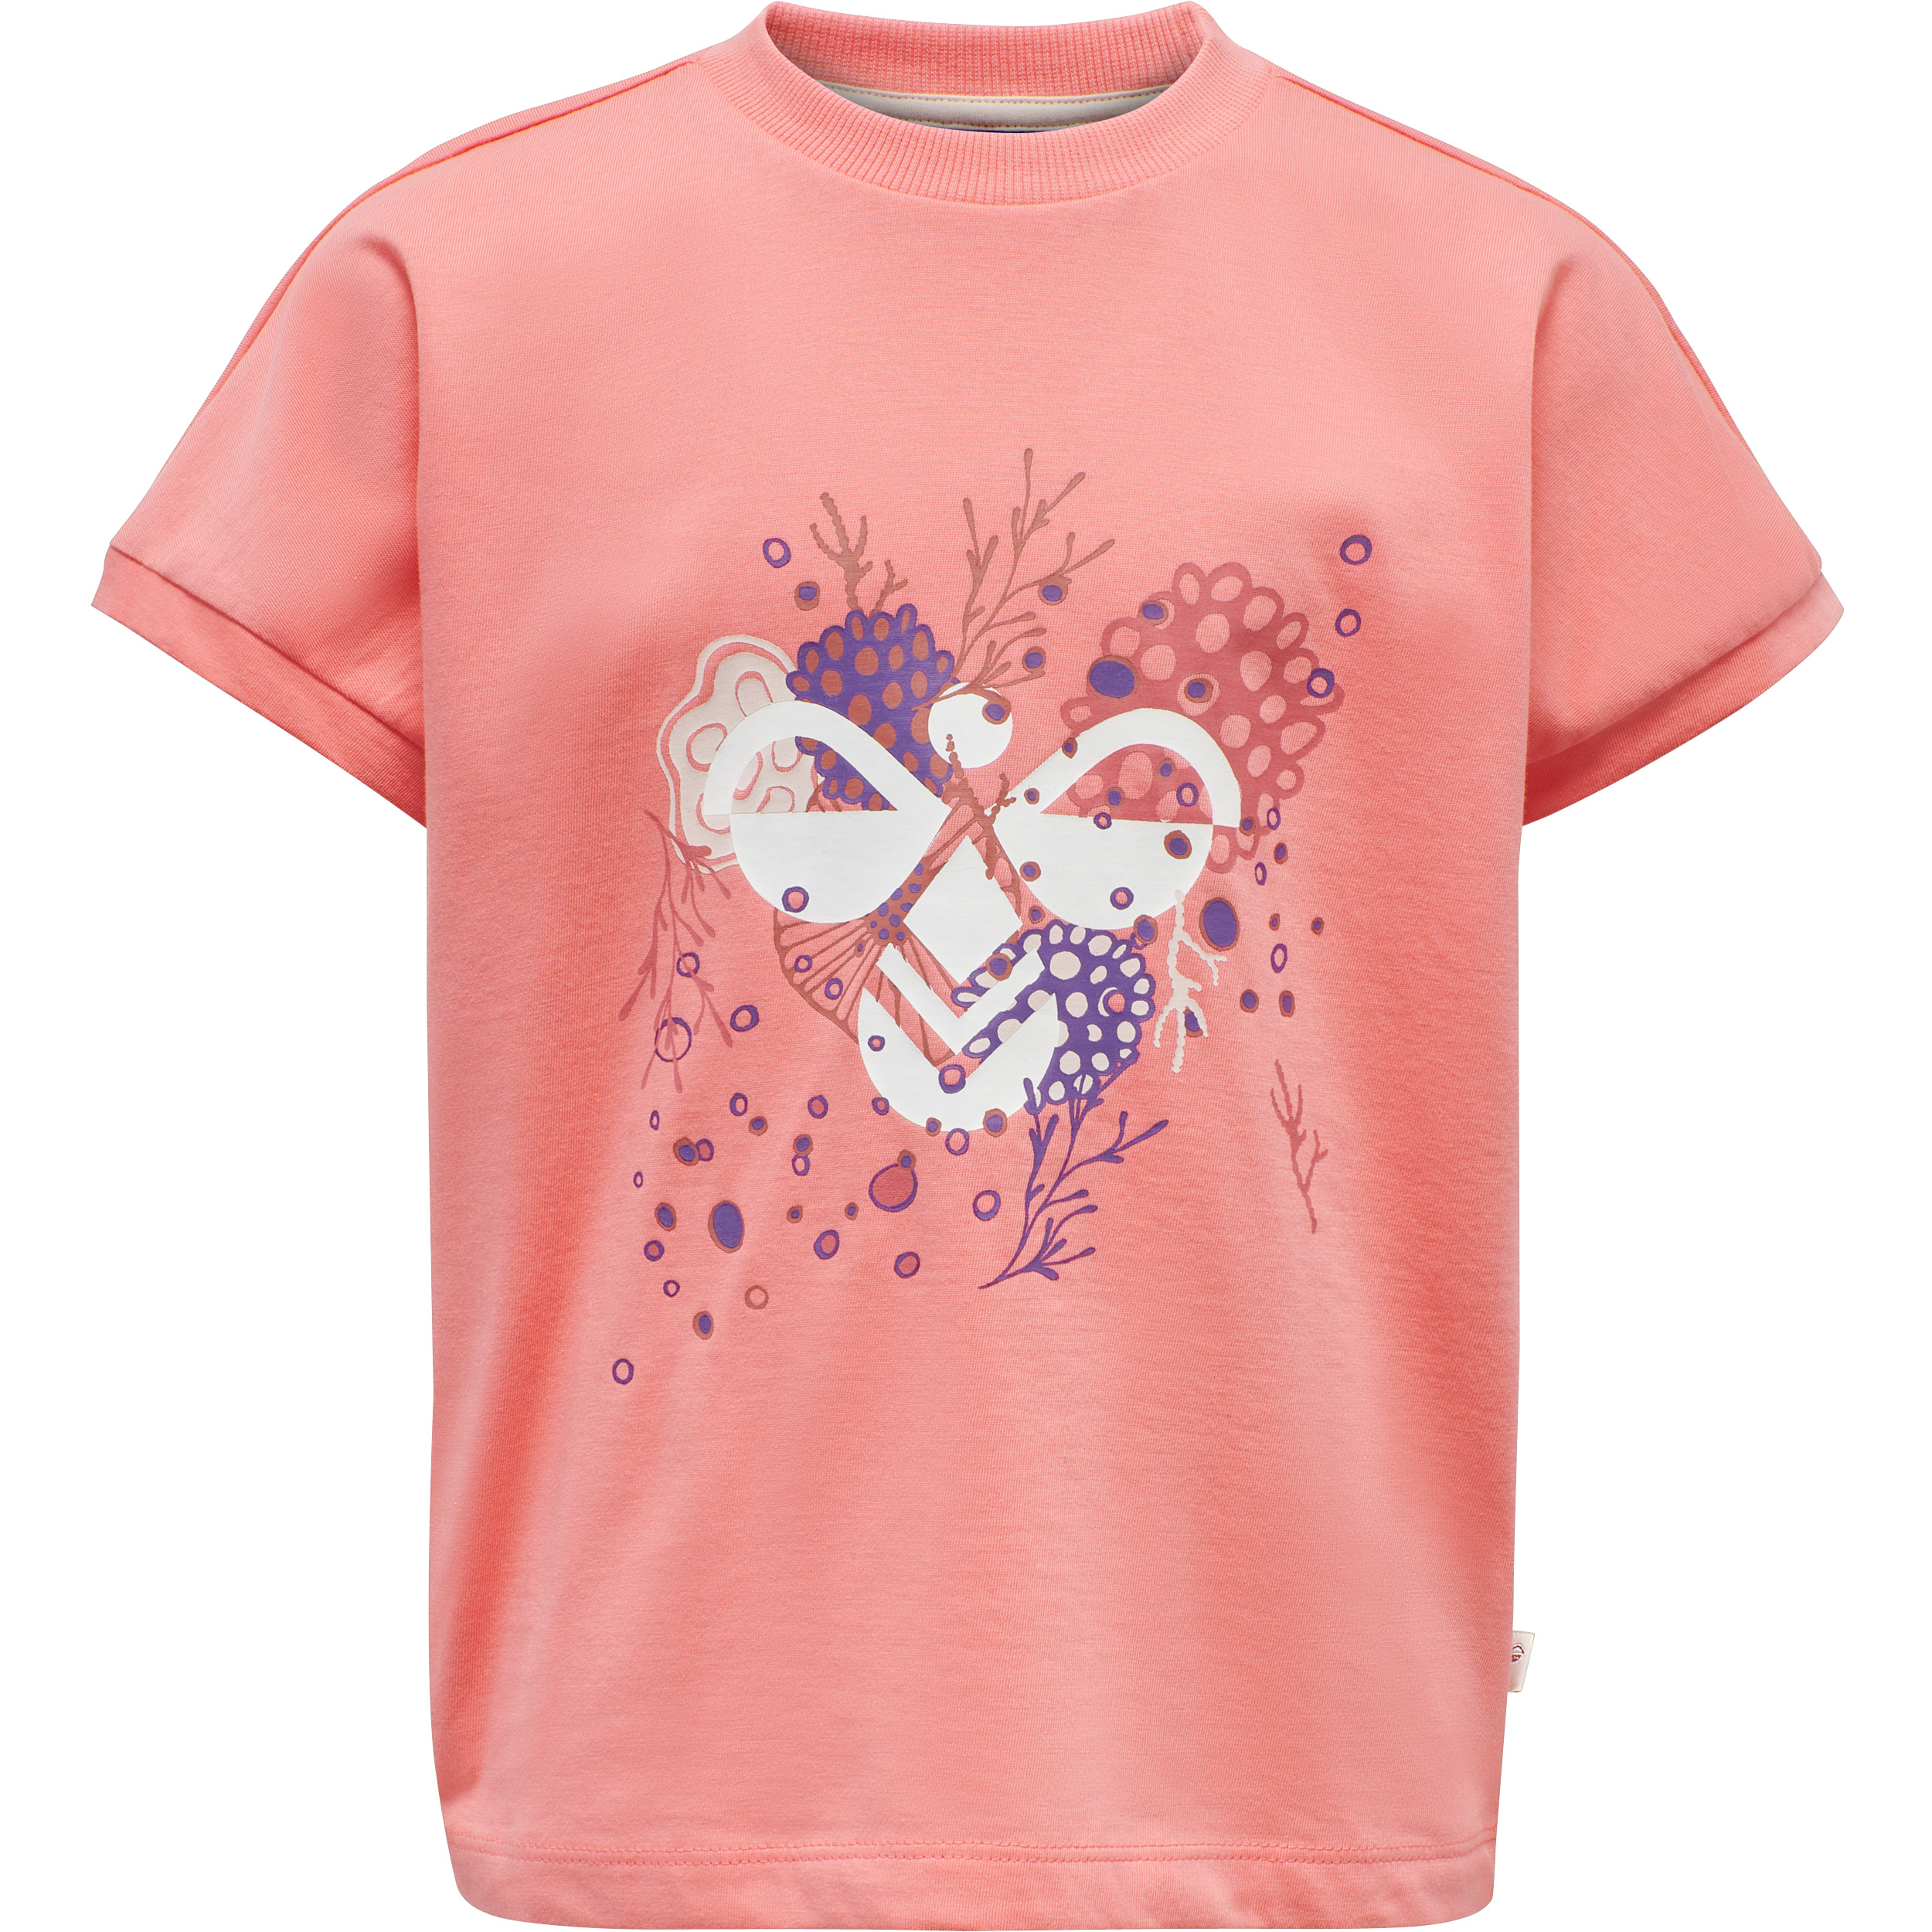 Hummel Atlantis SS t-shirt, Shell pink, 116